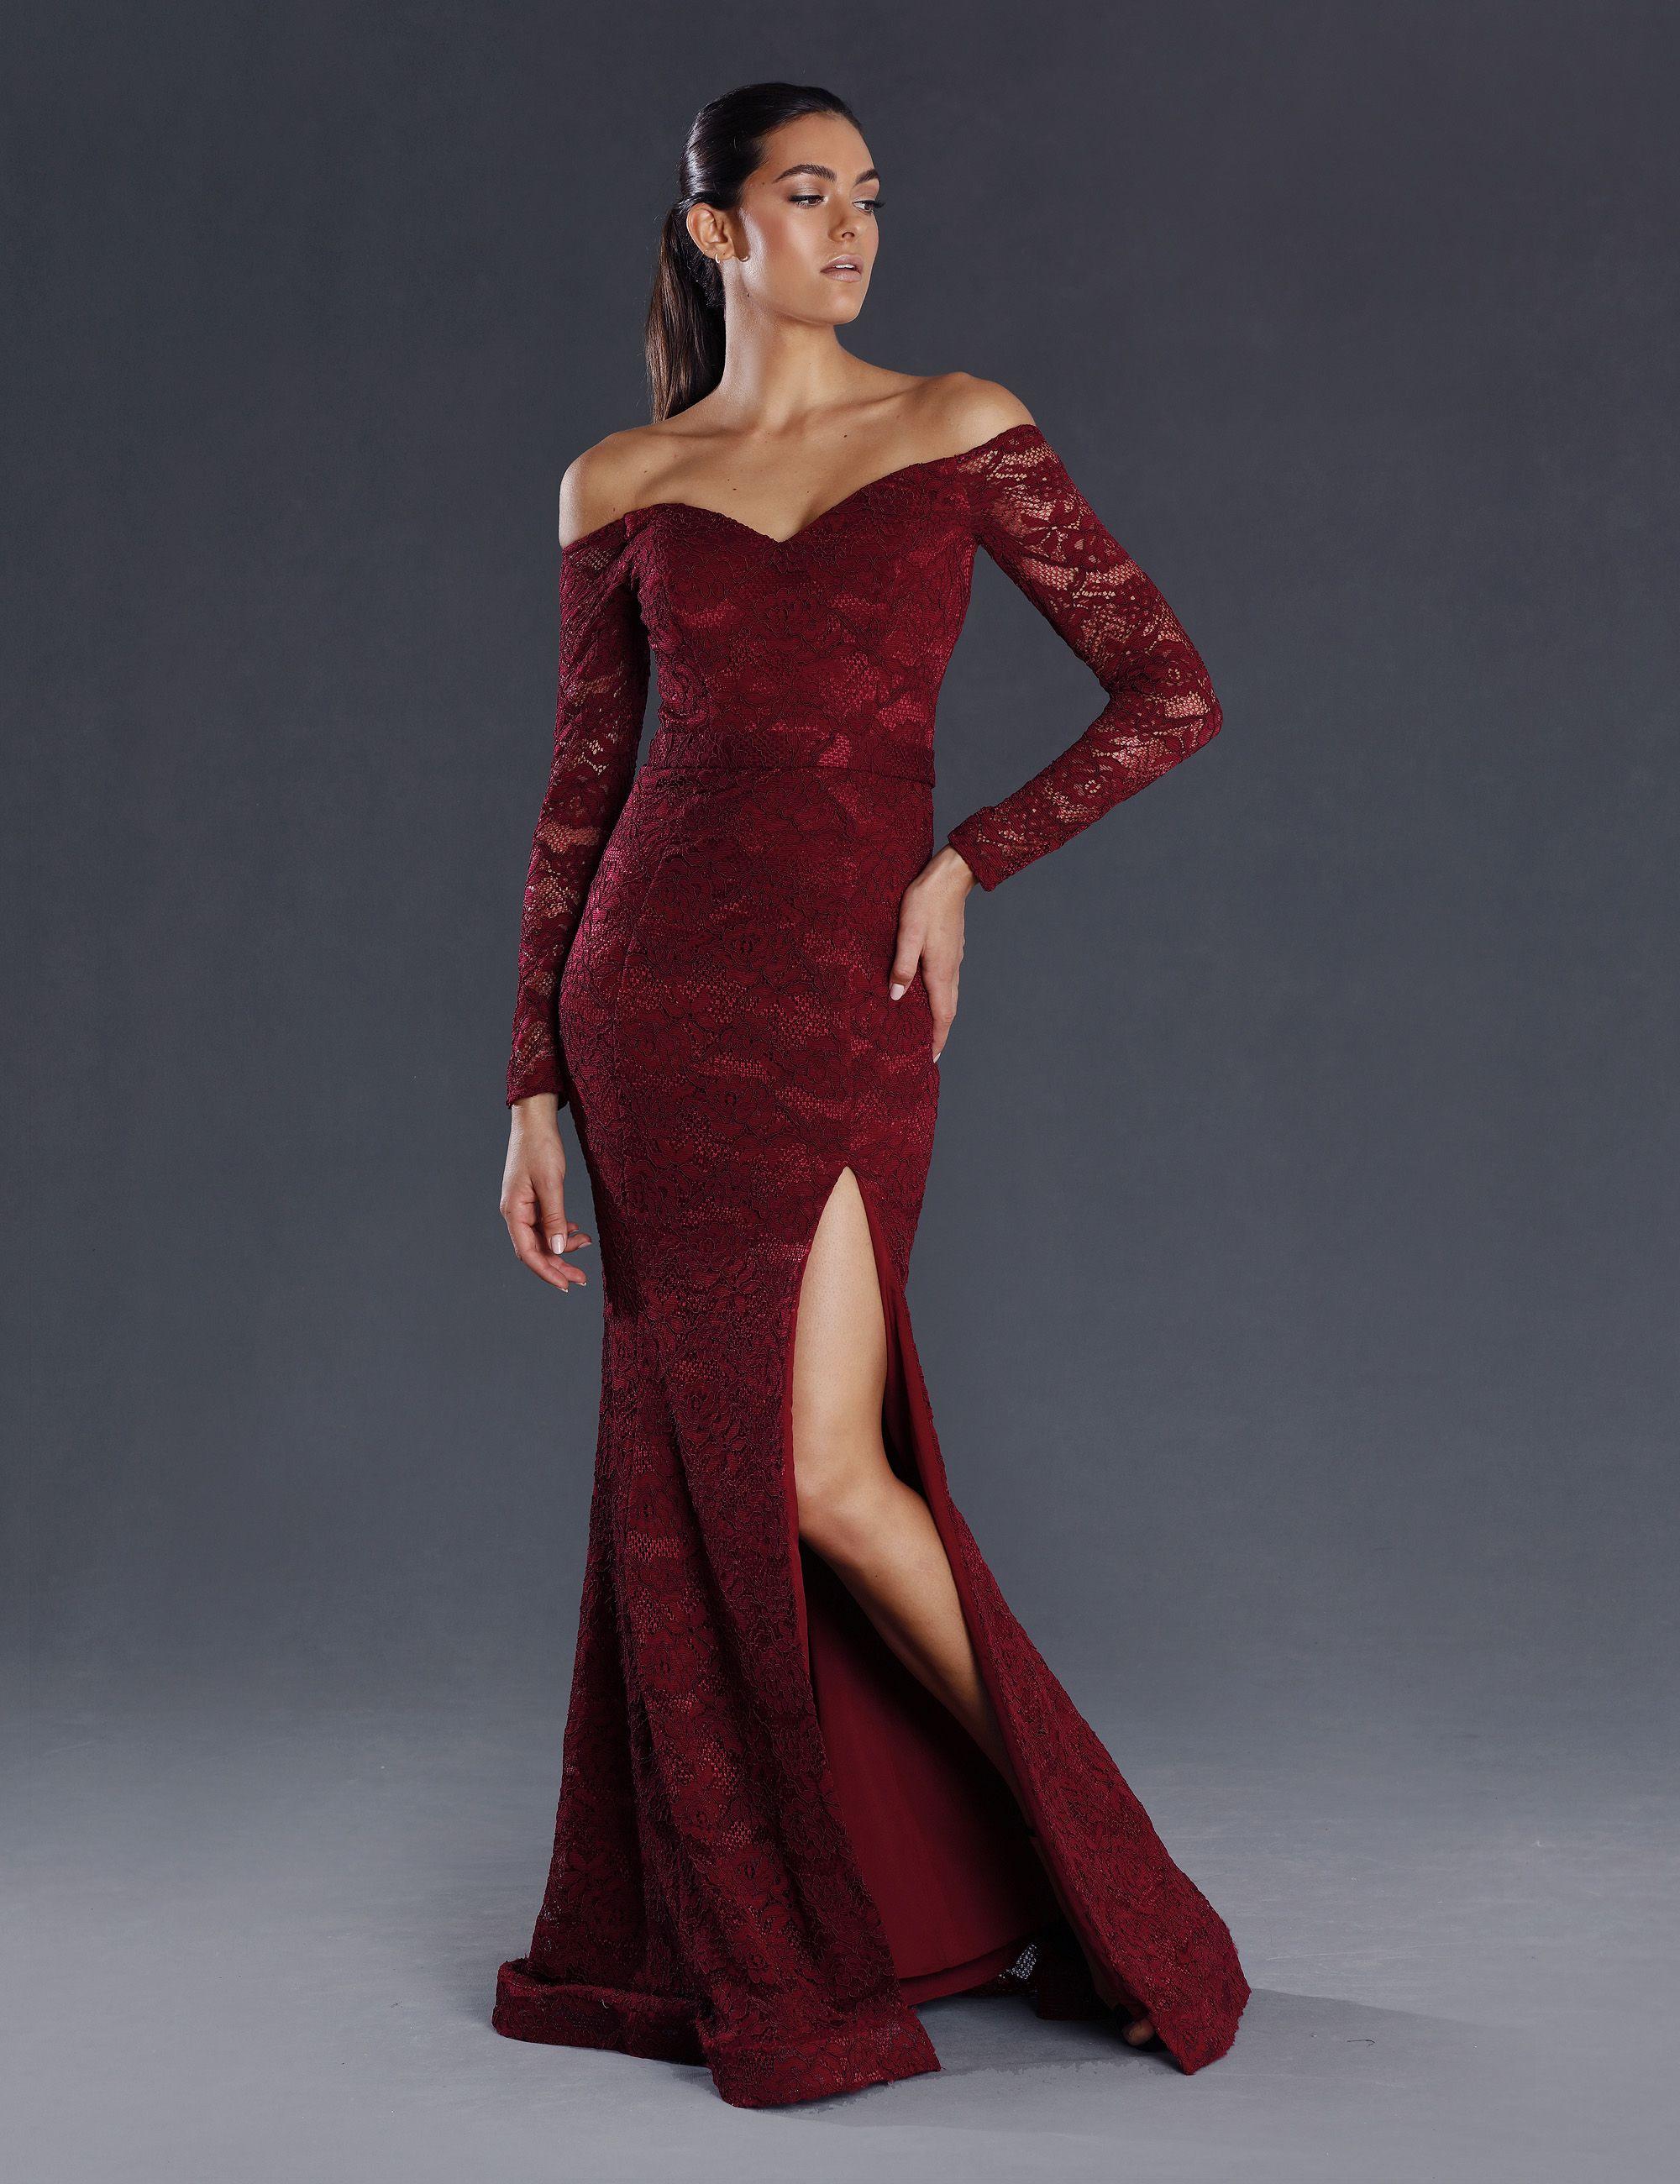 J adore dresses cocktail